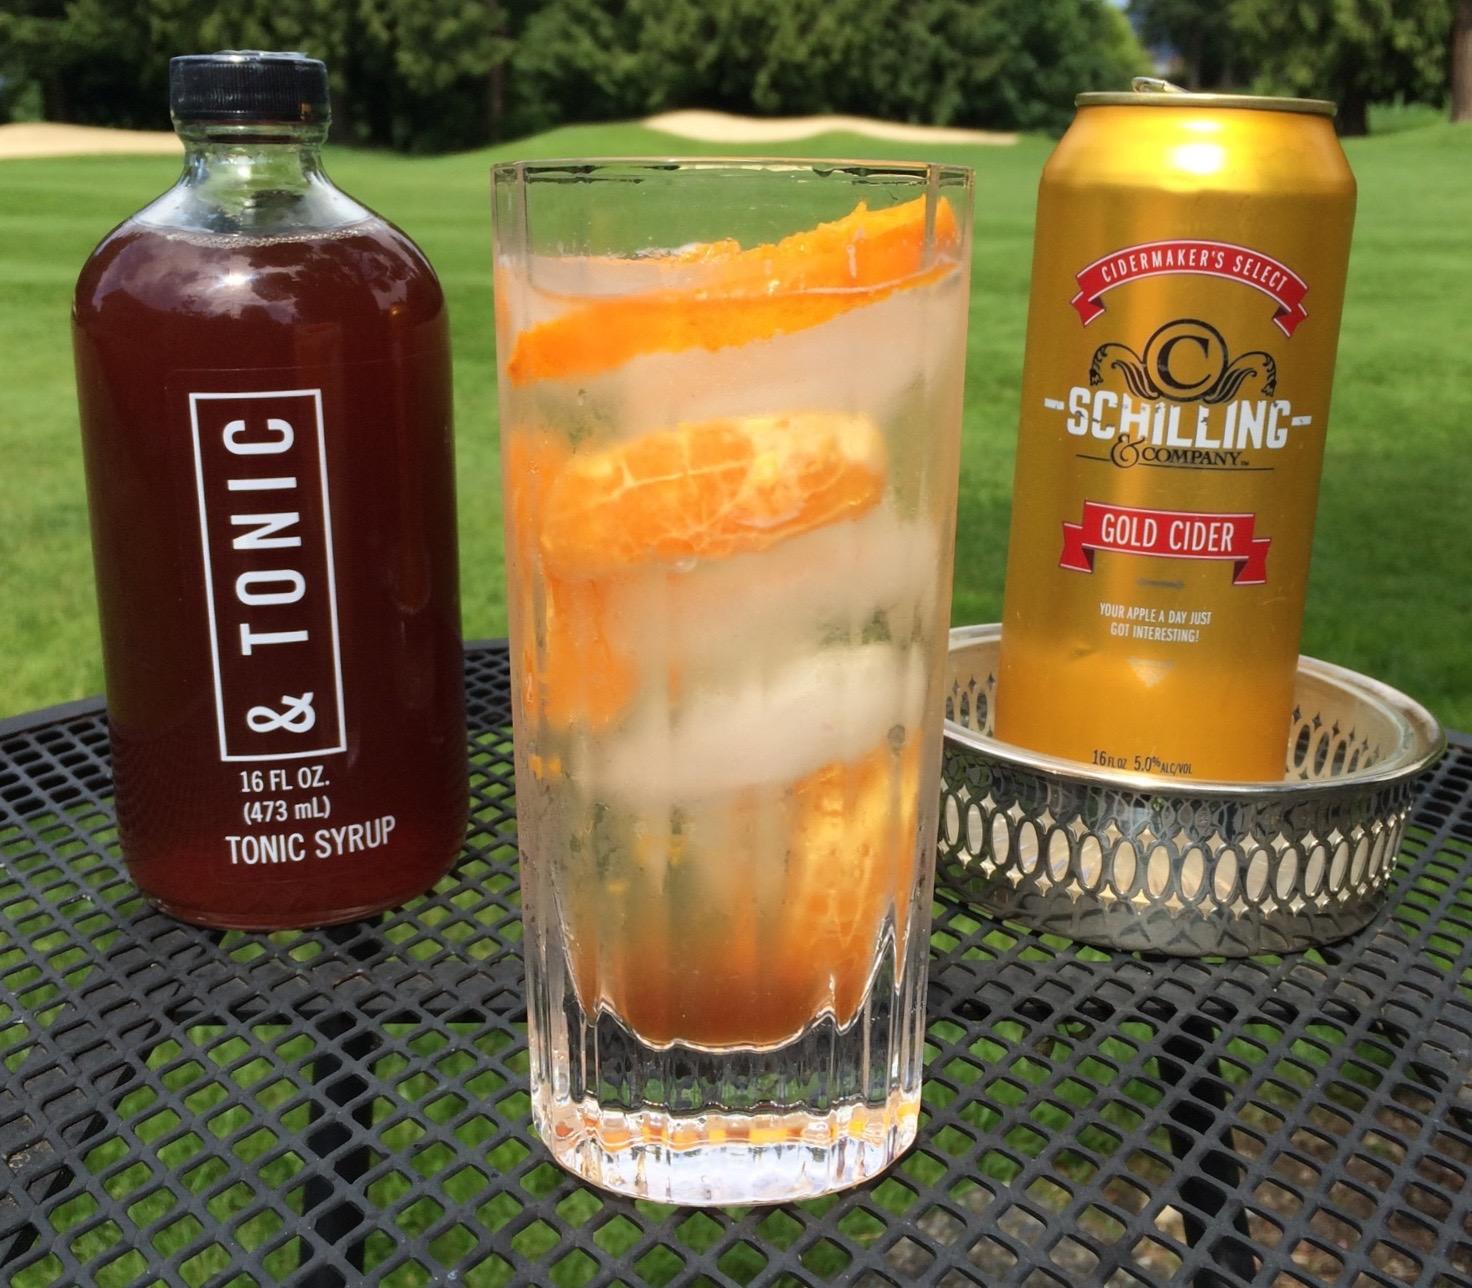 & TONIC artisanal tonic syrup creates craft cocktails